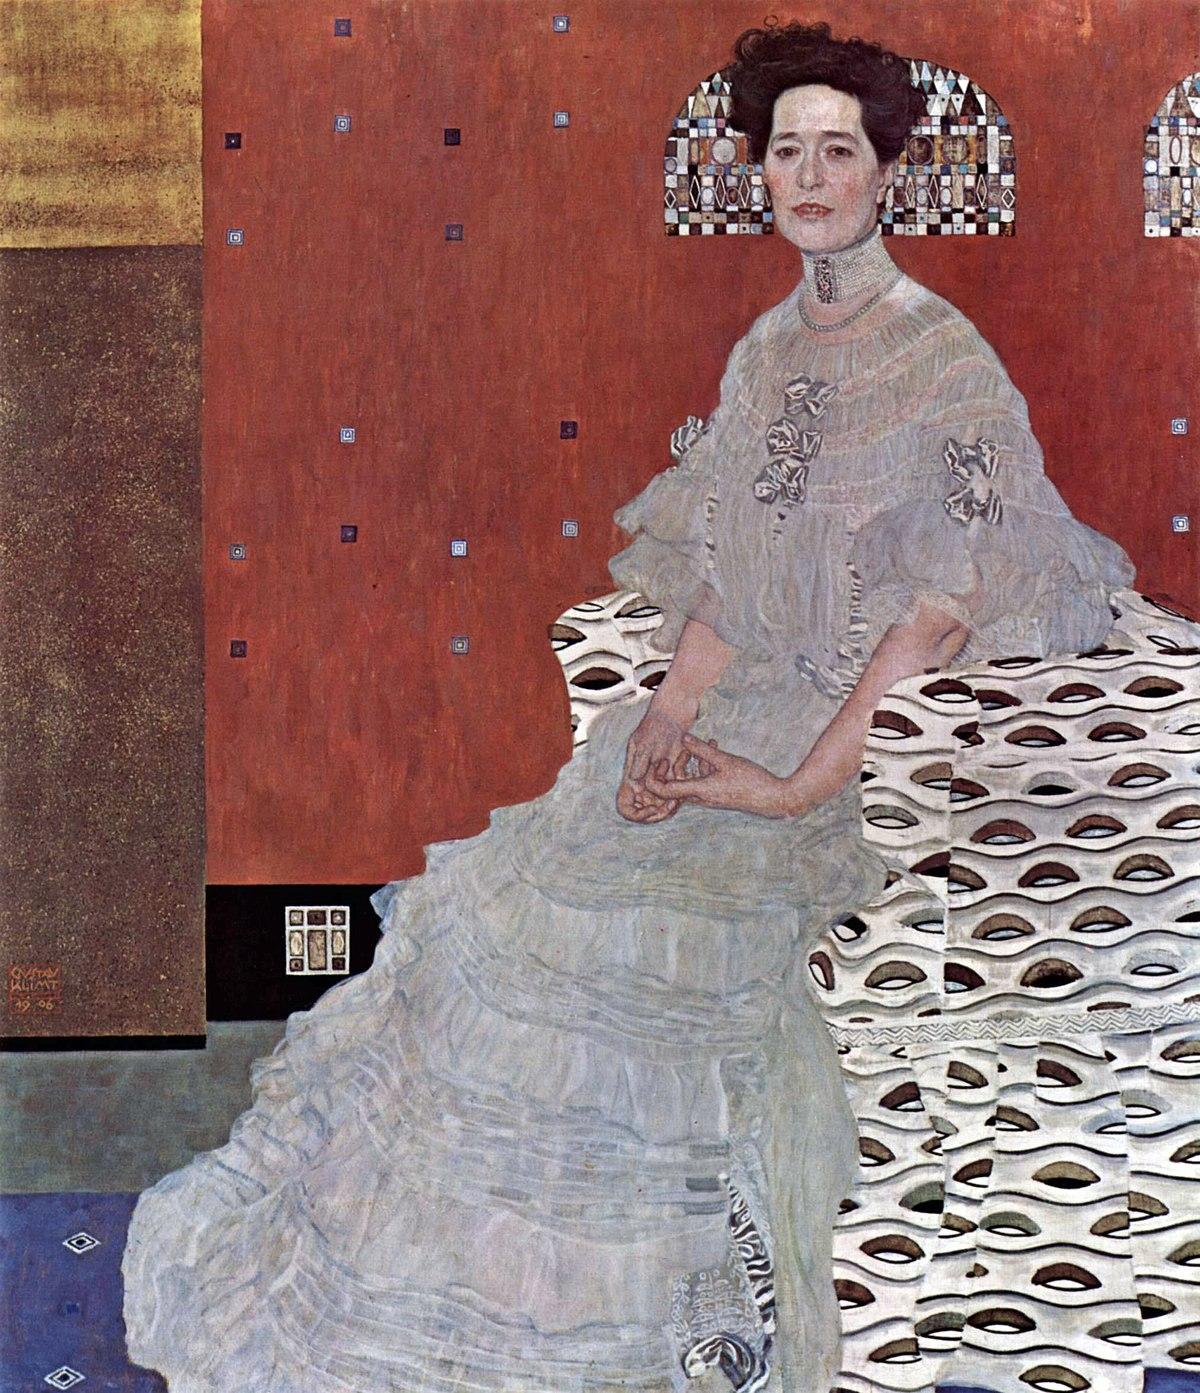 1200px-Gustav_Klimt_052_frau.jpg